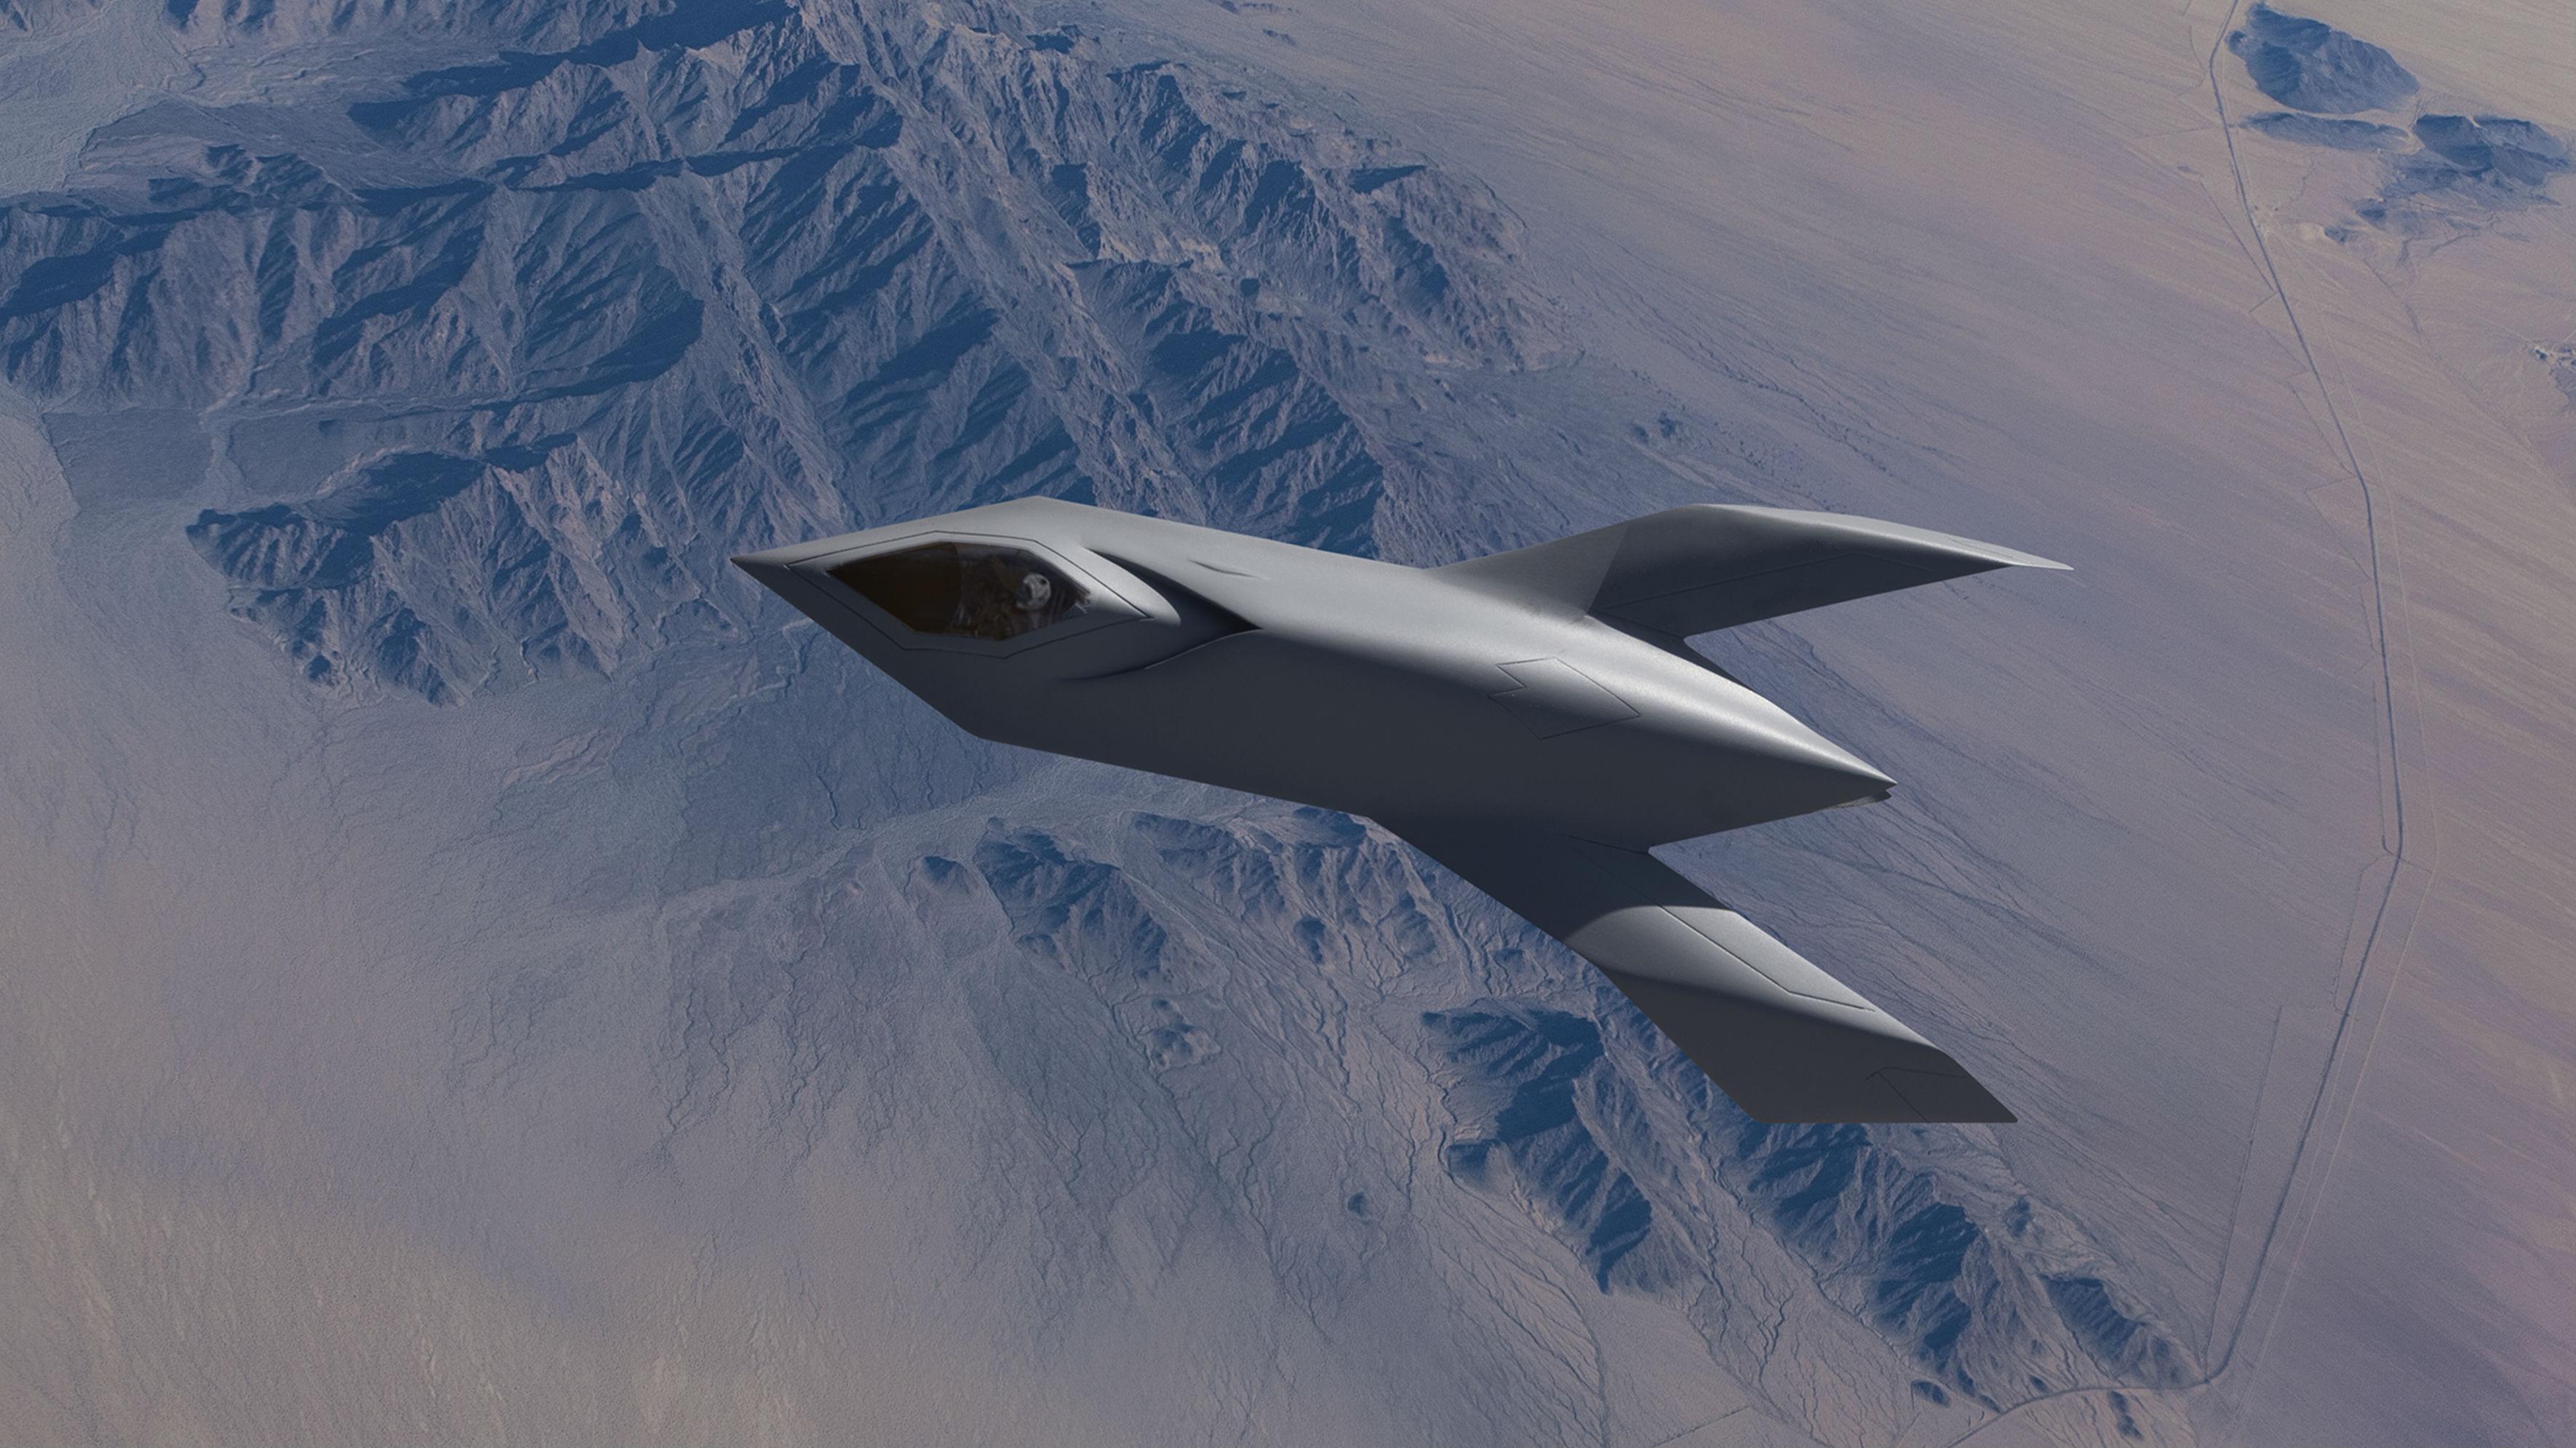 Boeing Bird of Prey